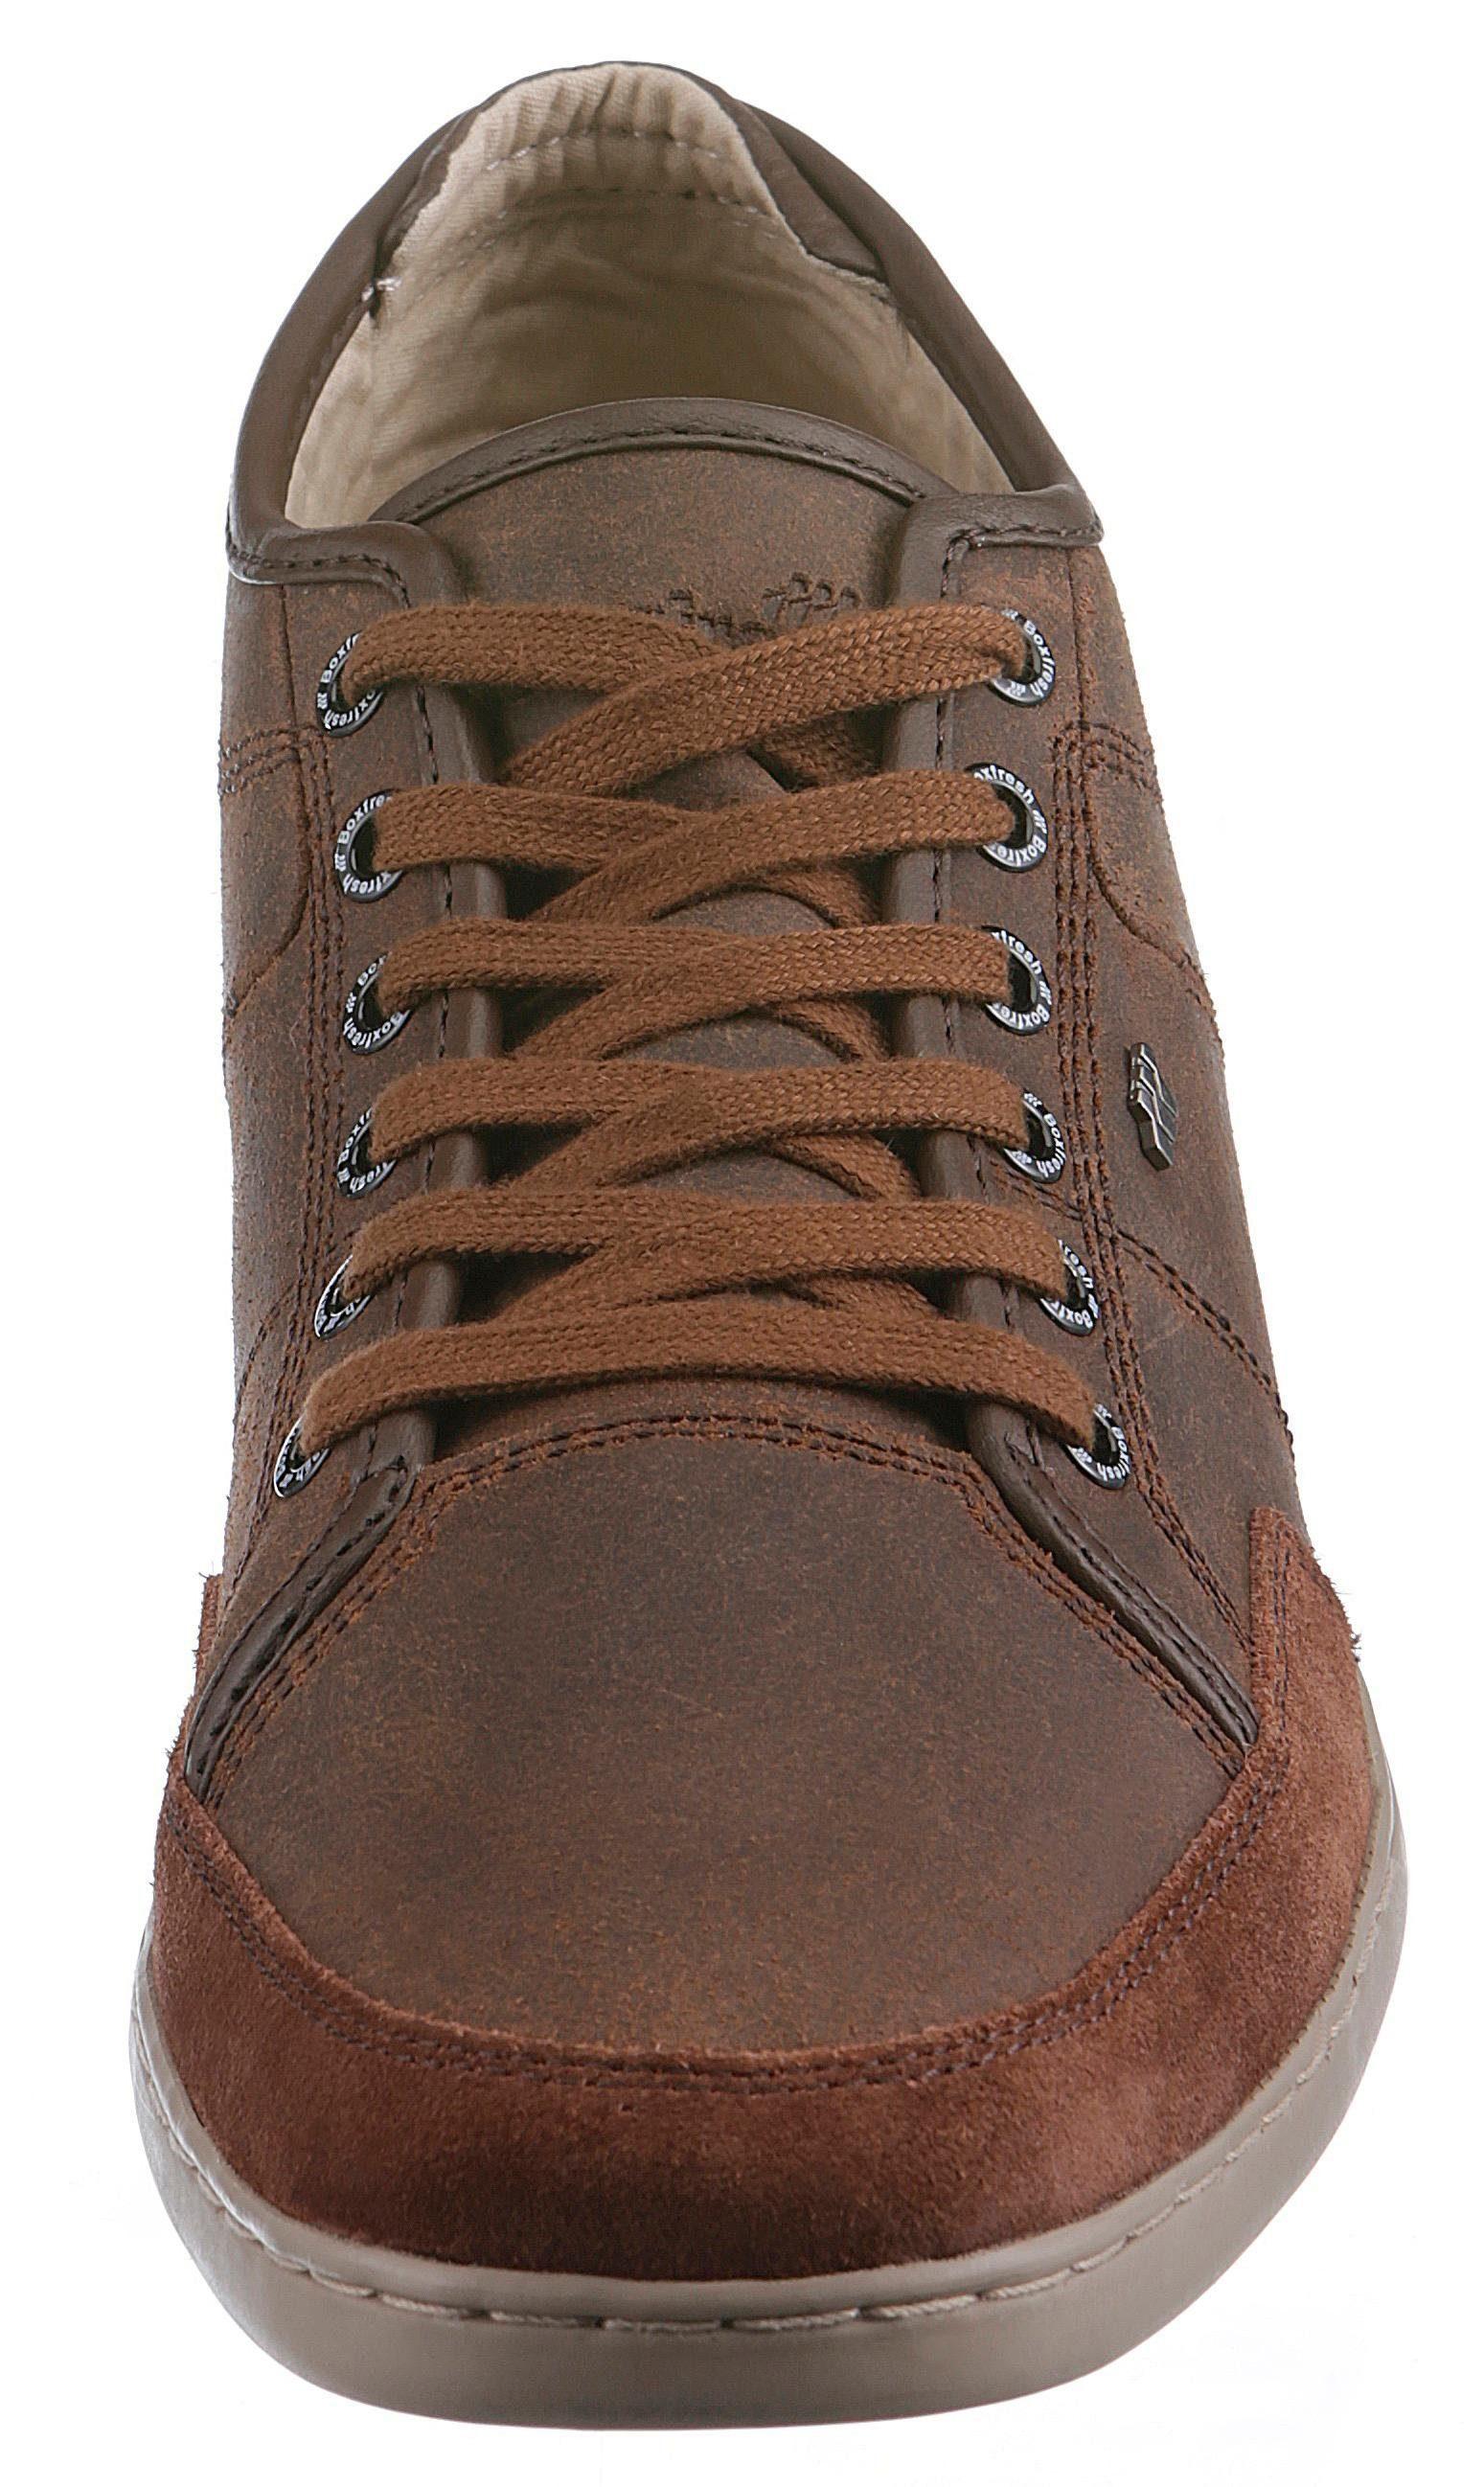 Artikel Kaufen Im Ledermix Sneaker nr Schwarz 4081144759 Sparko Boxfresh XPUCqw46